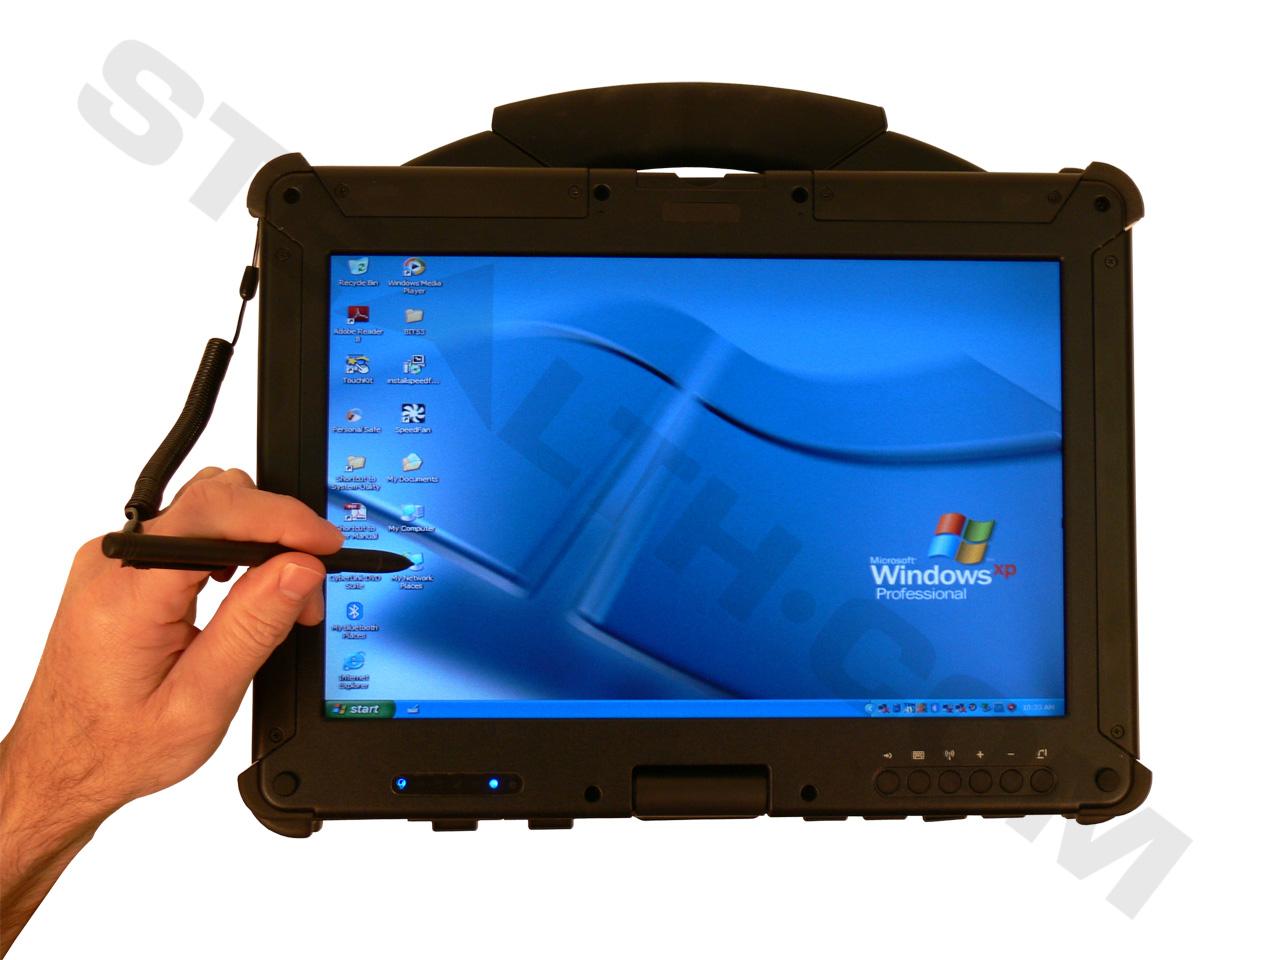 Ноутбук Stealth NW-2000 в усиленном корпусе